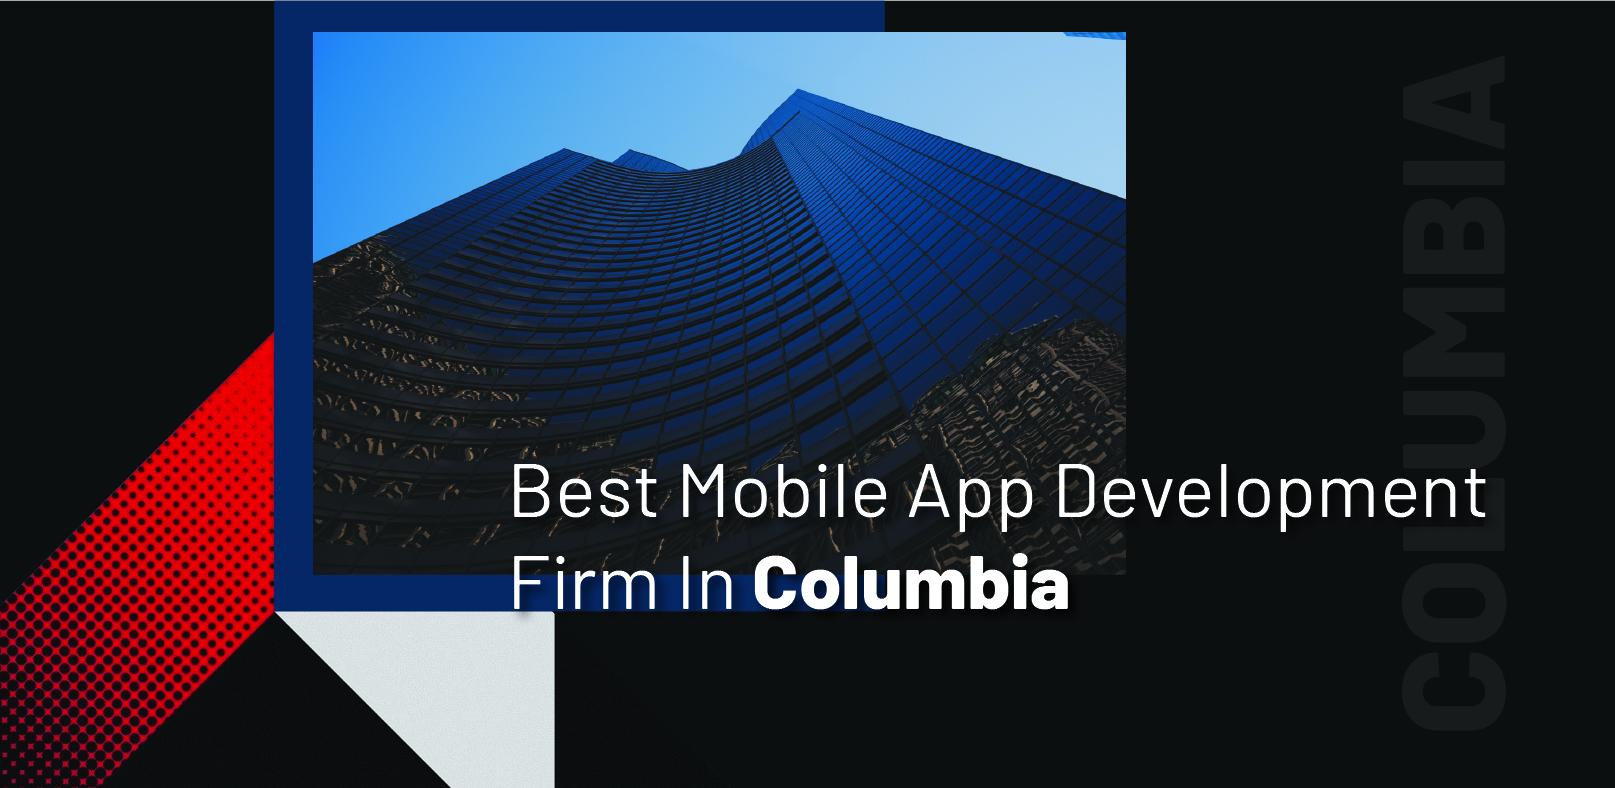 Best Mobile App Development Firm In Columbia - WebClues Infotech